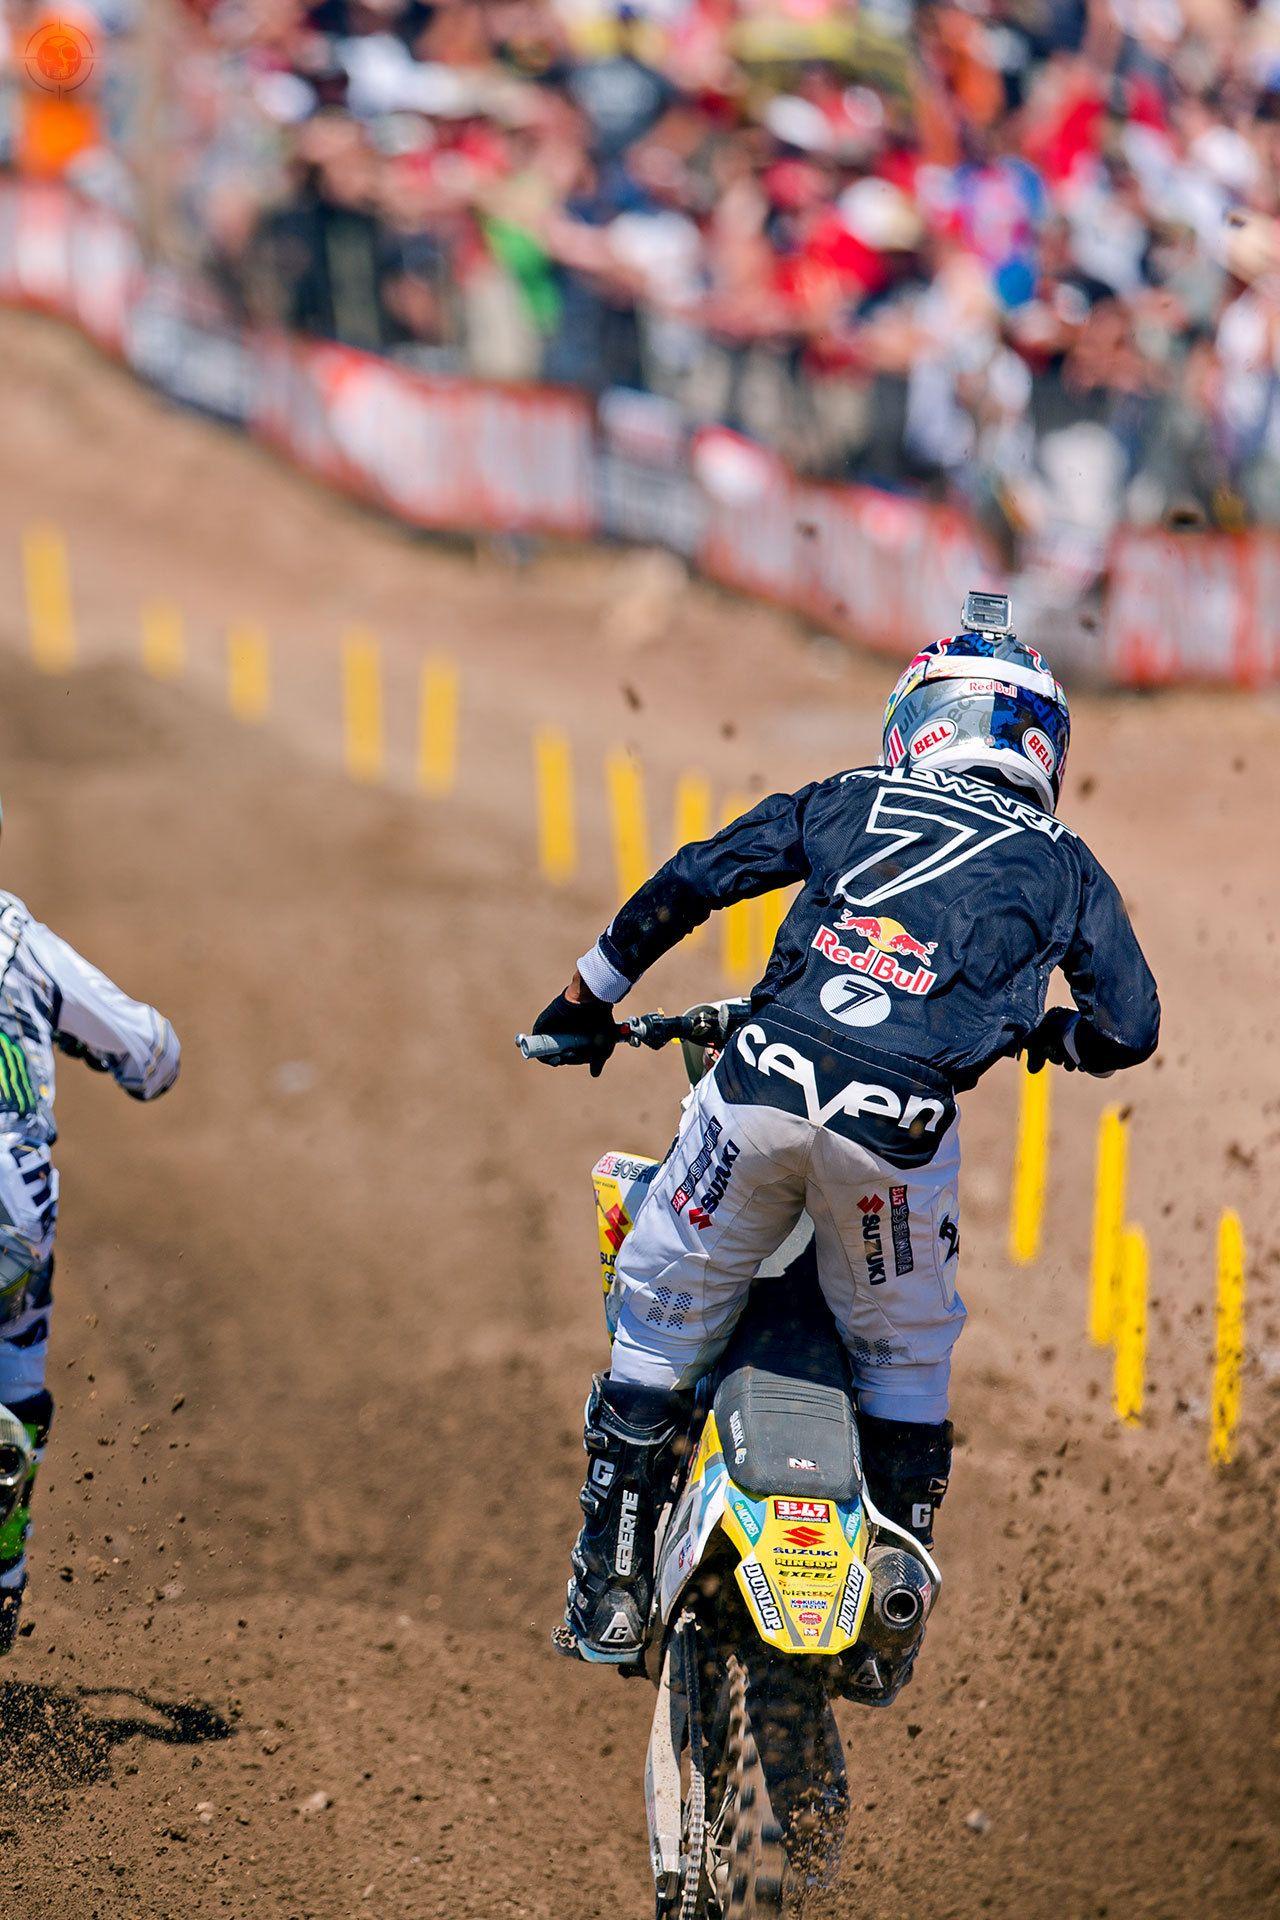 Motocross Lovers Moto Motocross Dirtbikes Dirt Bike Racing